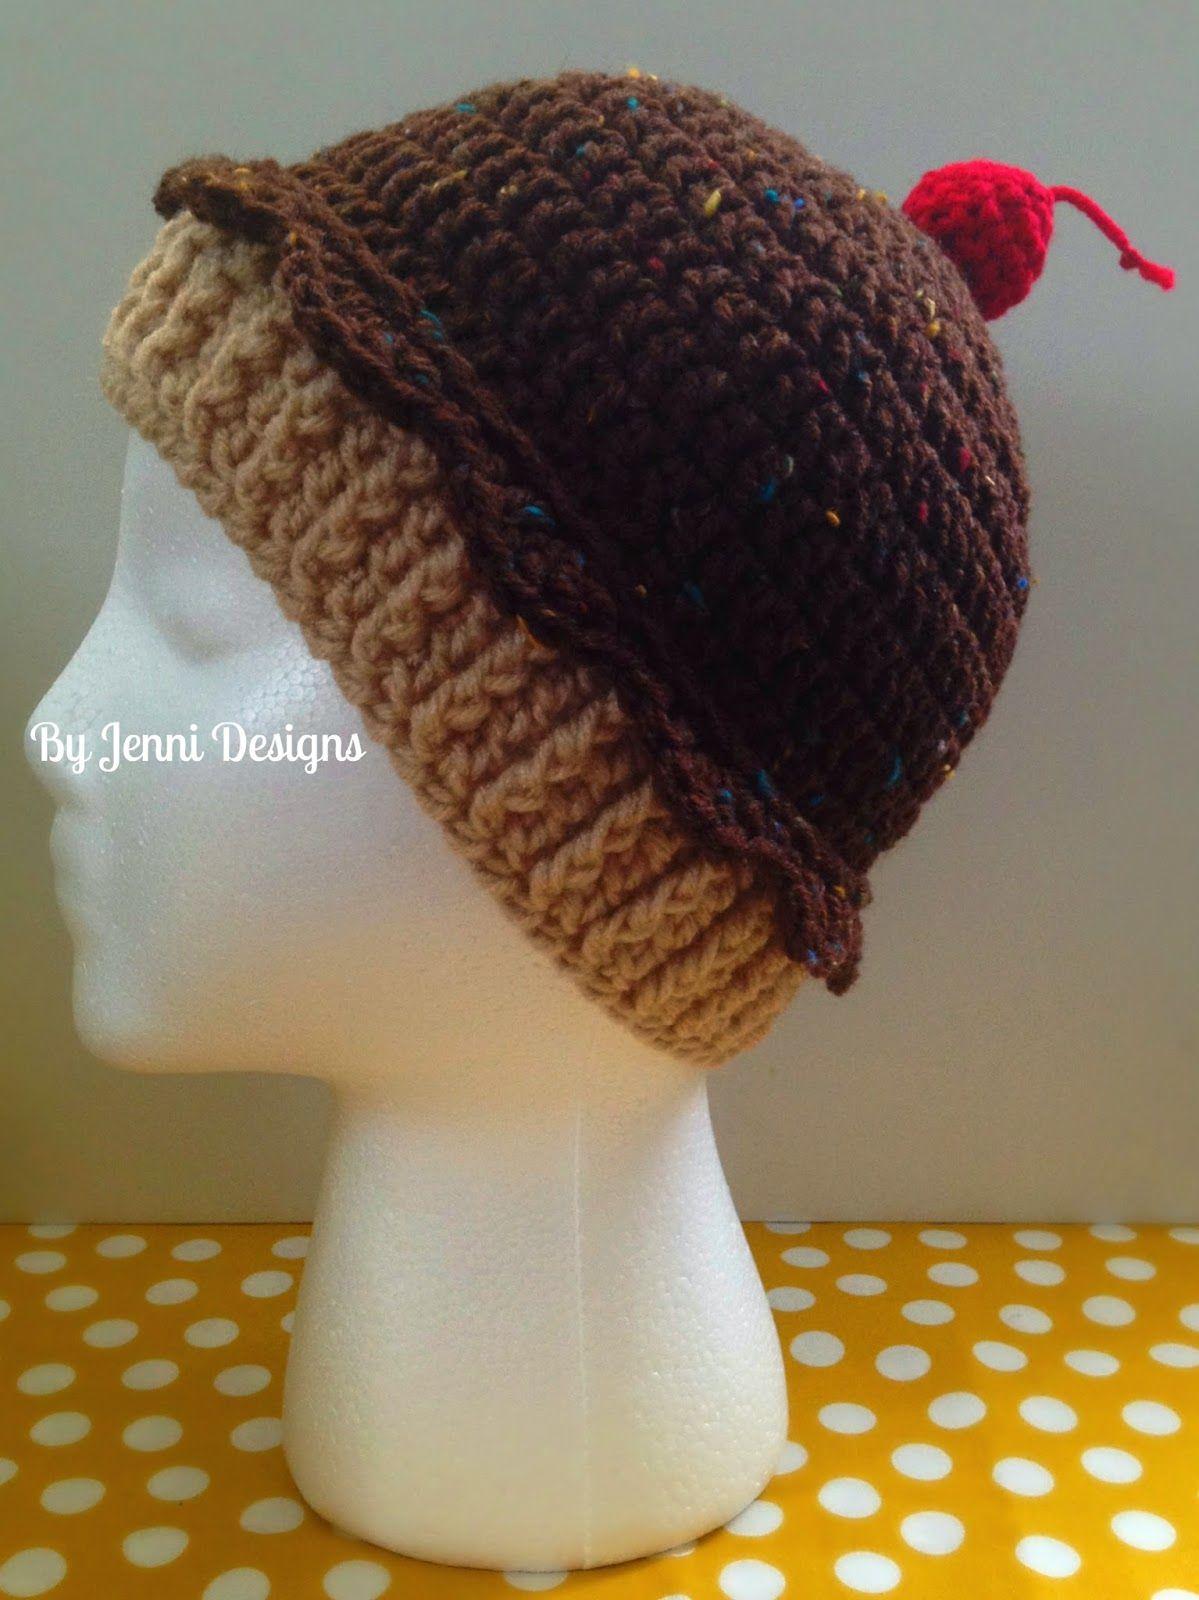 By jenni designs youth size crochet cupcake hat free pattern by jenni designs youth size crochet cupcake hat free pattern bankloansurffo Images